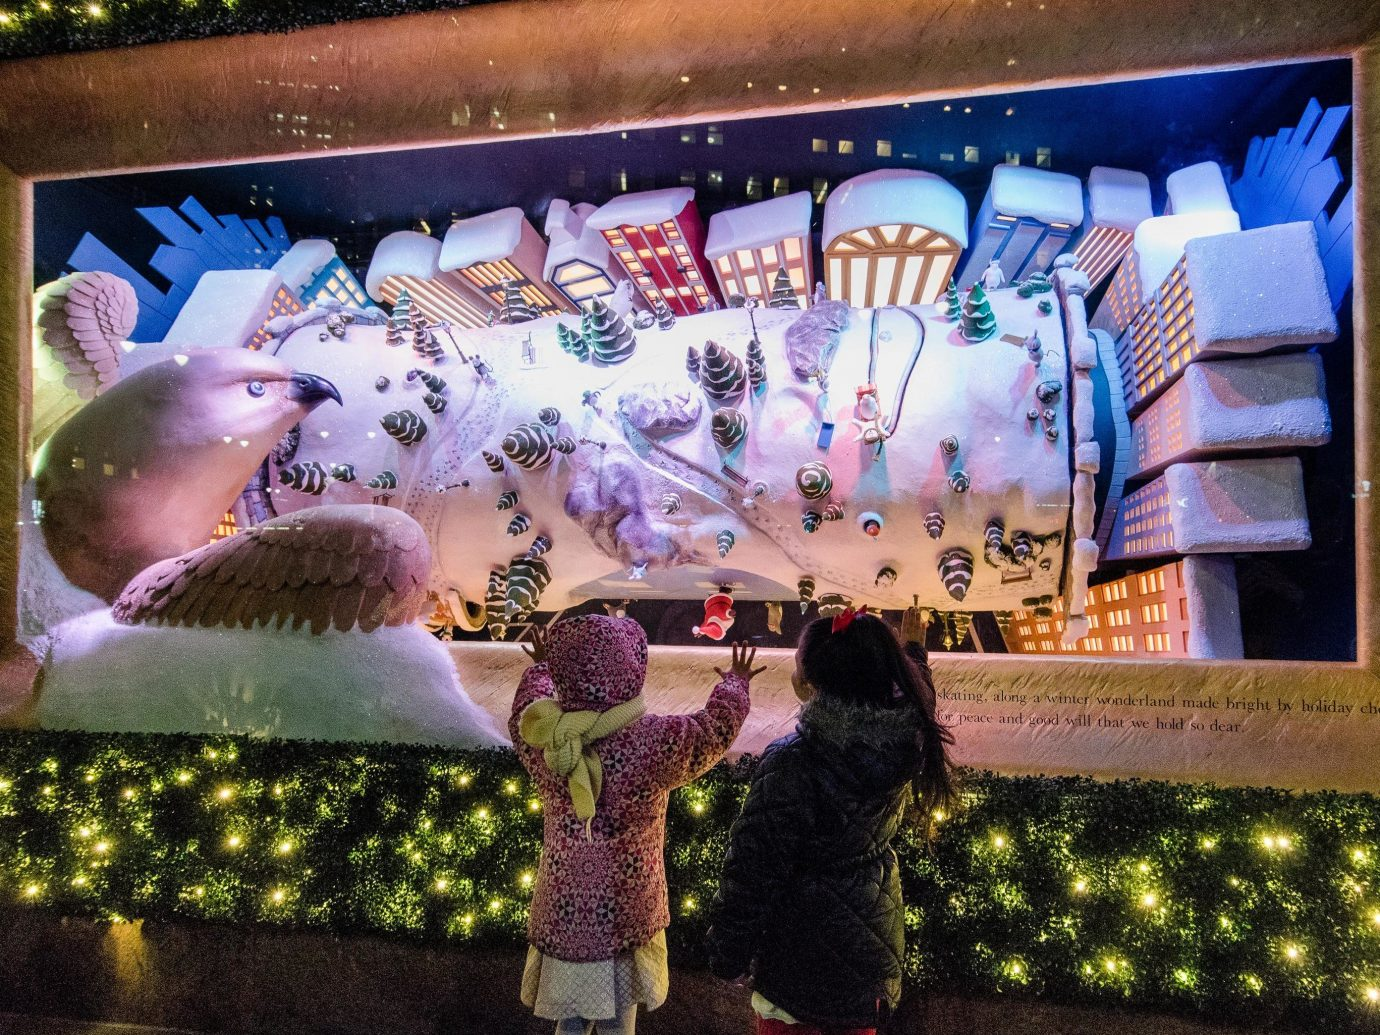 Offbeat Winter art display window fun world decorated recreation graphics tourism